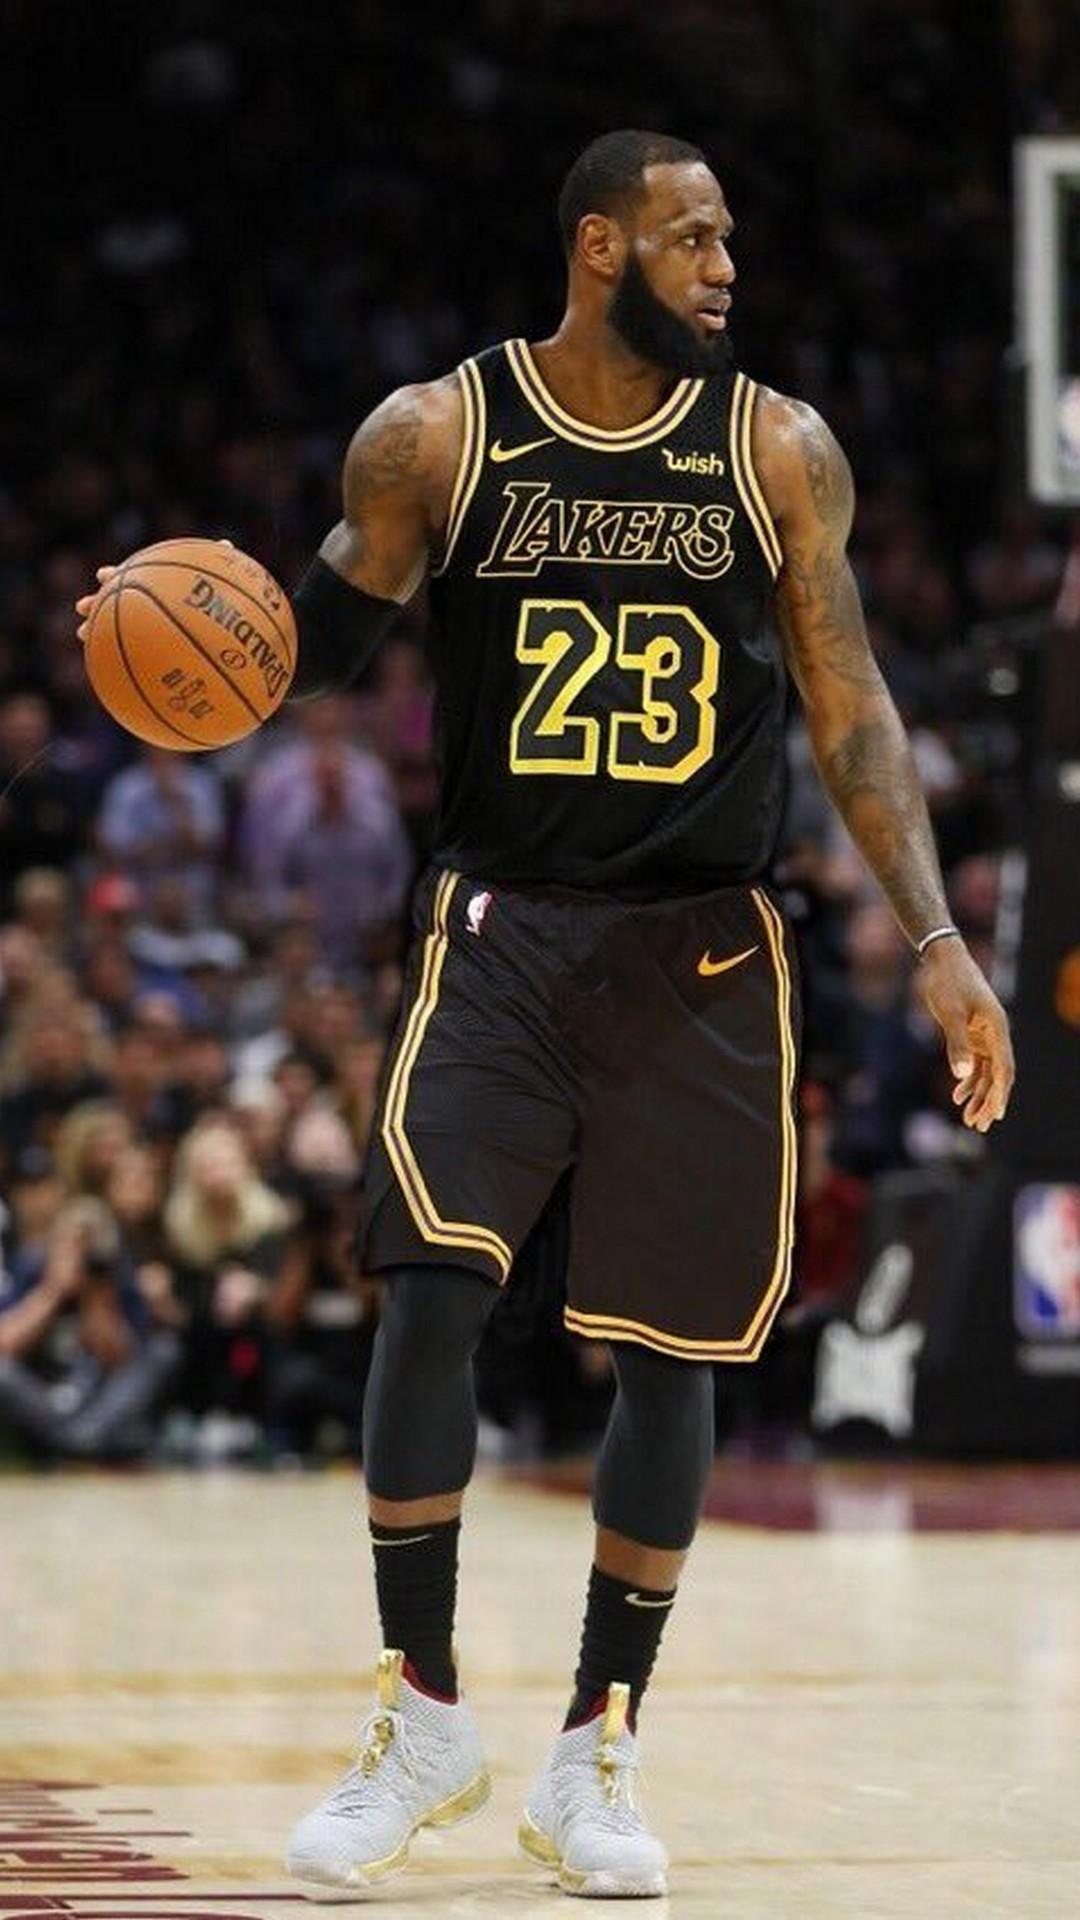 LeBron James LA Lakers iPhone 6 Wallpaper 2020 Basketball Wallpaper 1080x1920